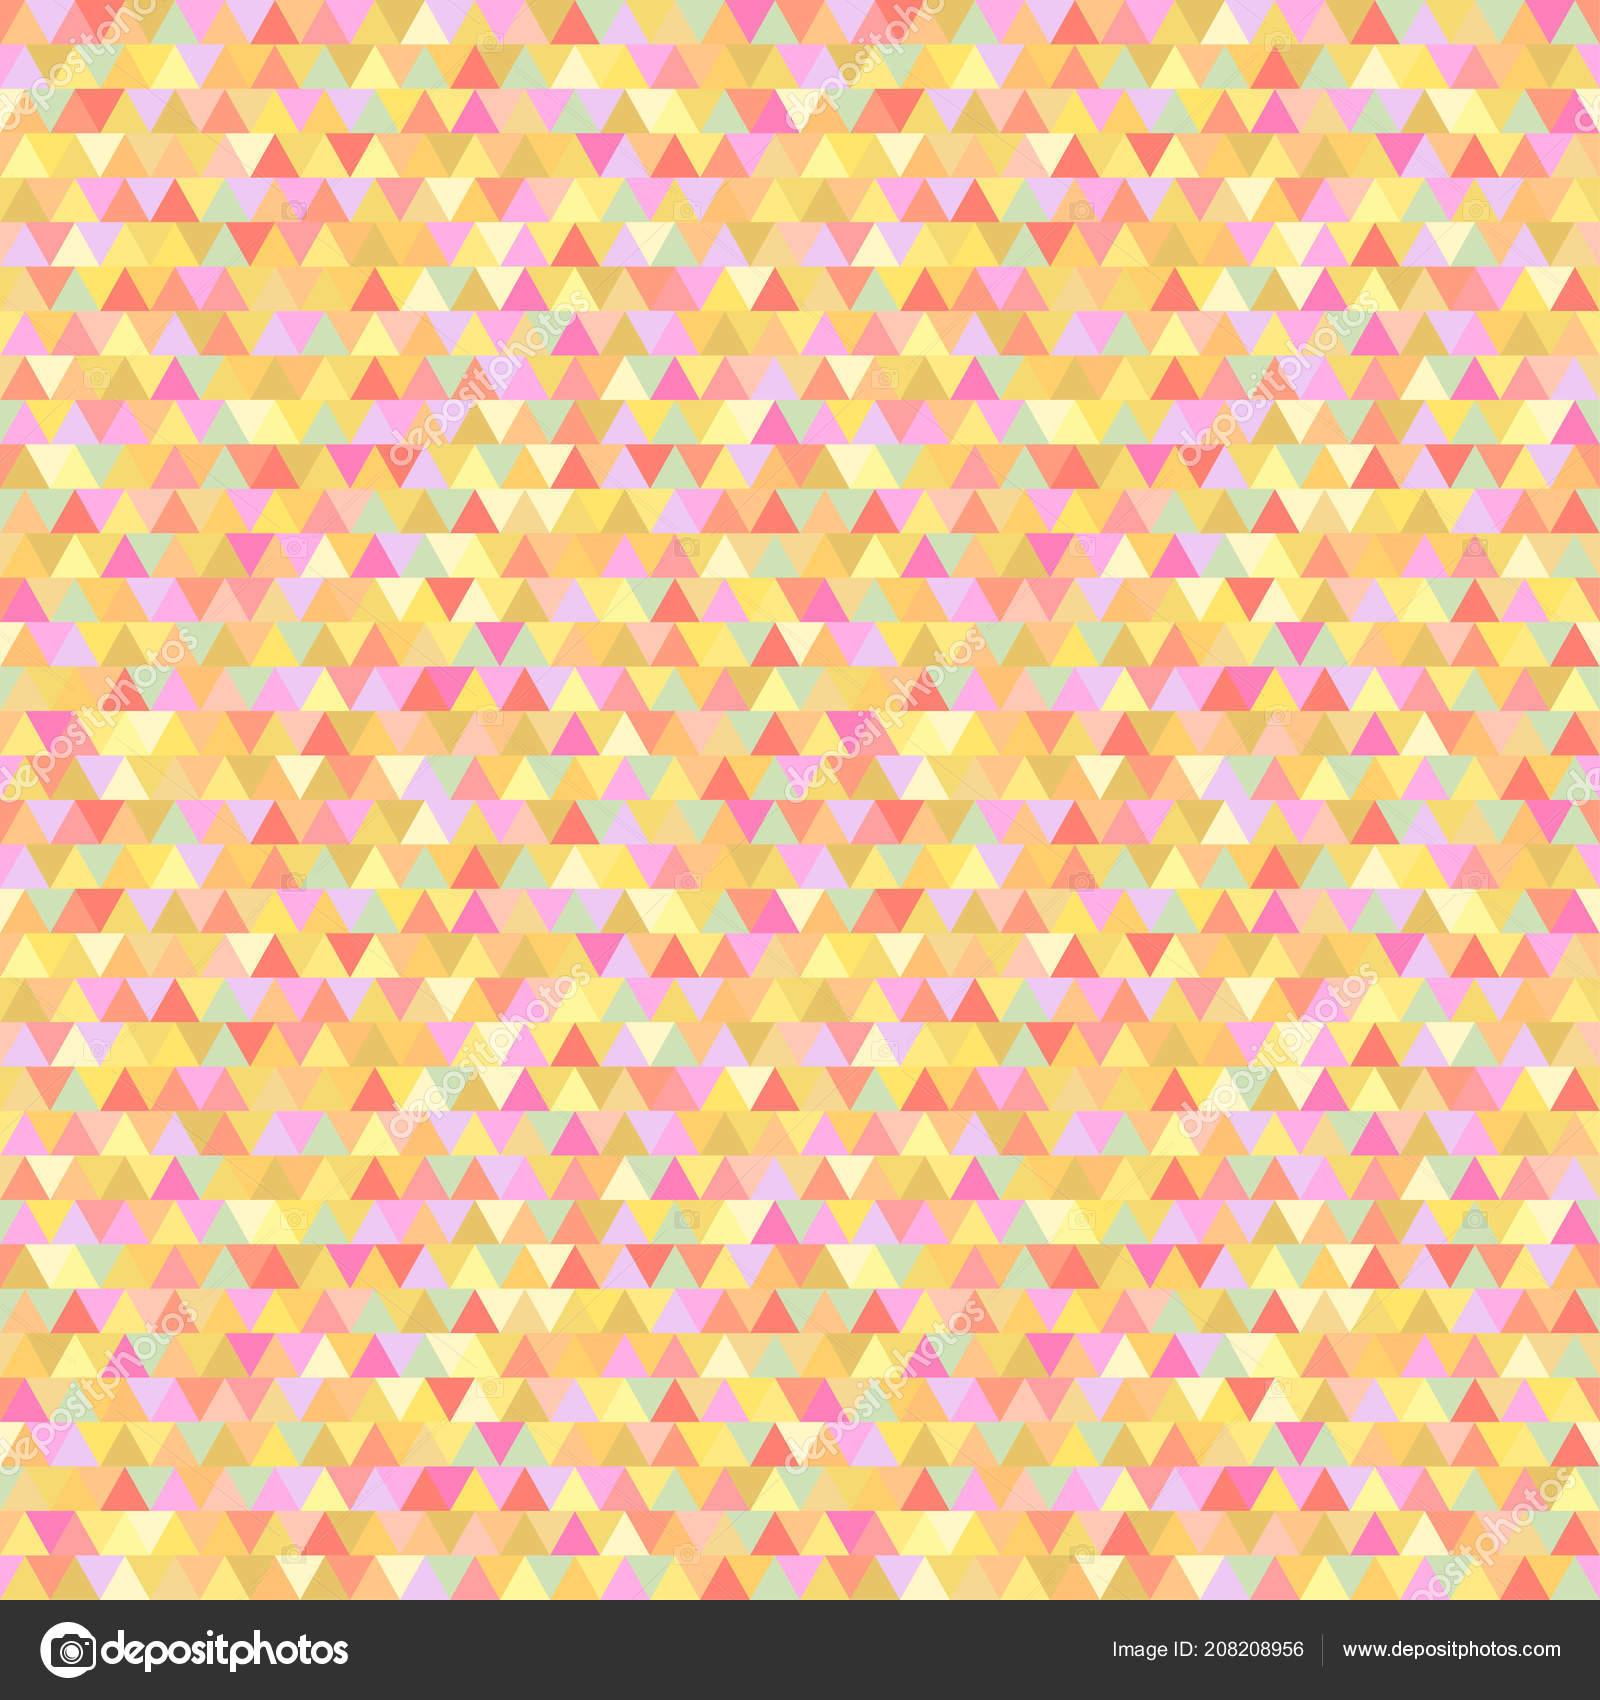 Pastel Geometric Wallpaper Seamless Triangle Pattern